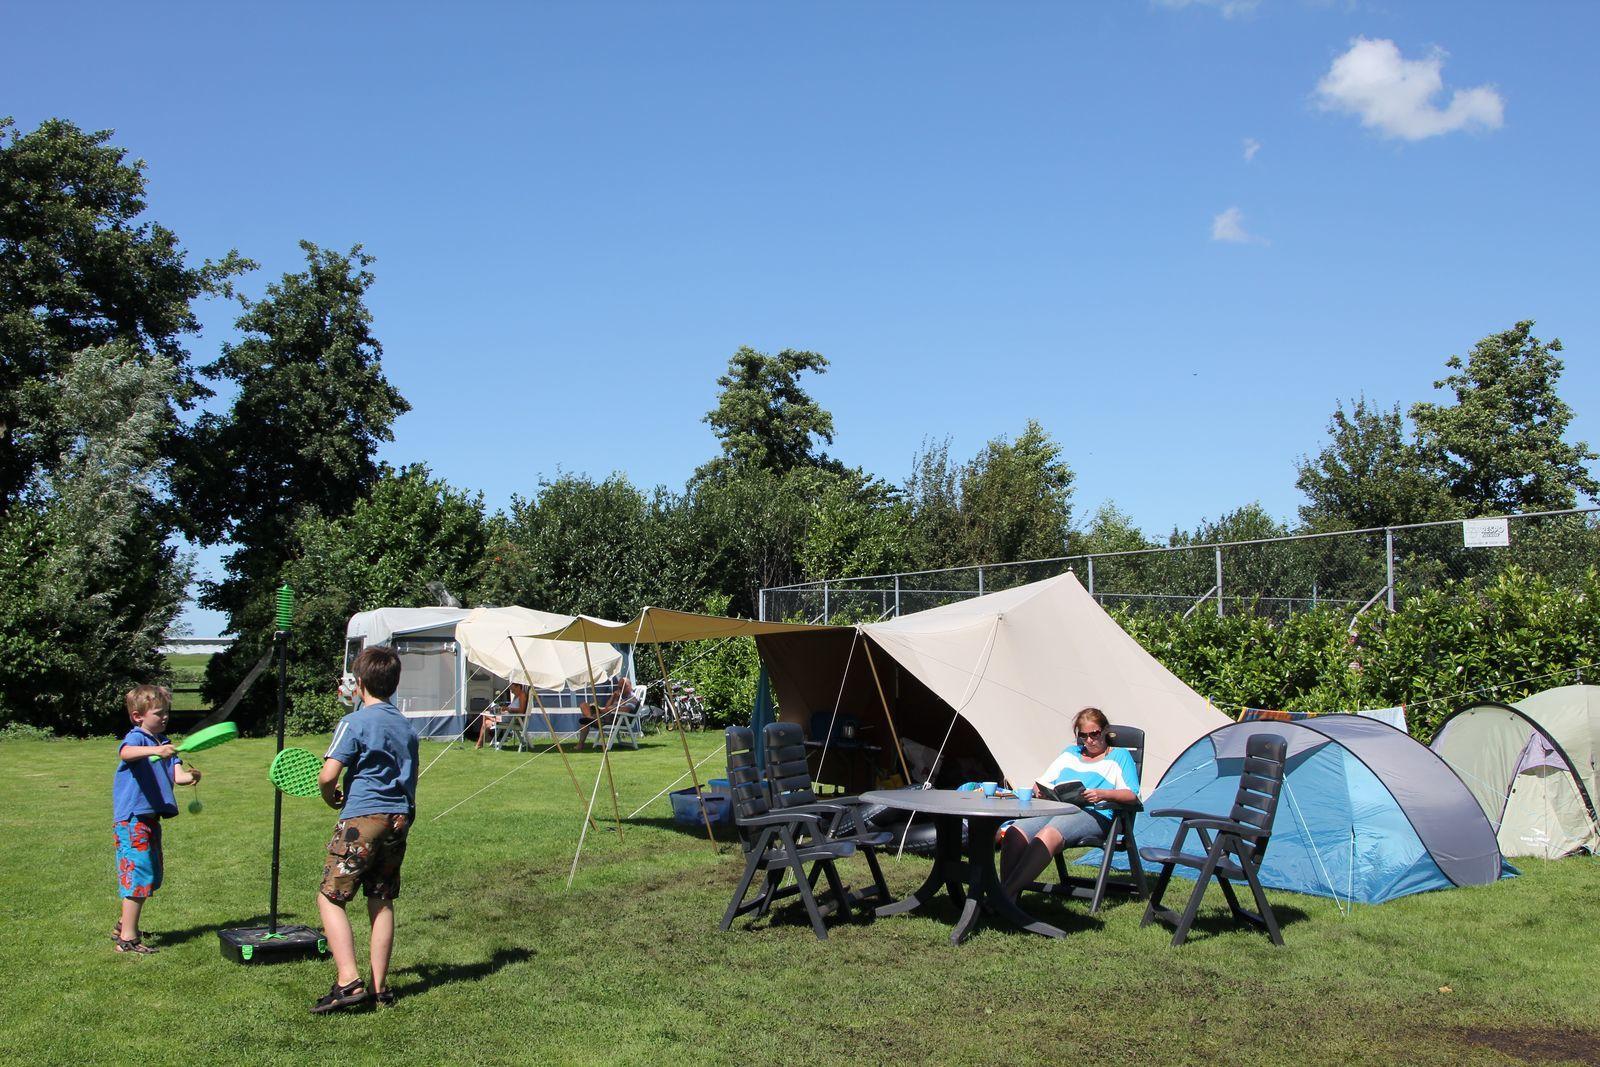 Camper, caravan or tent pitch, 10 Amp